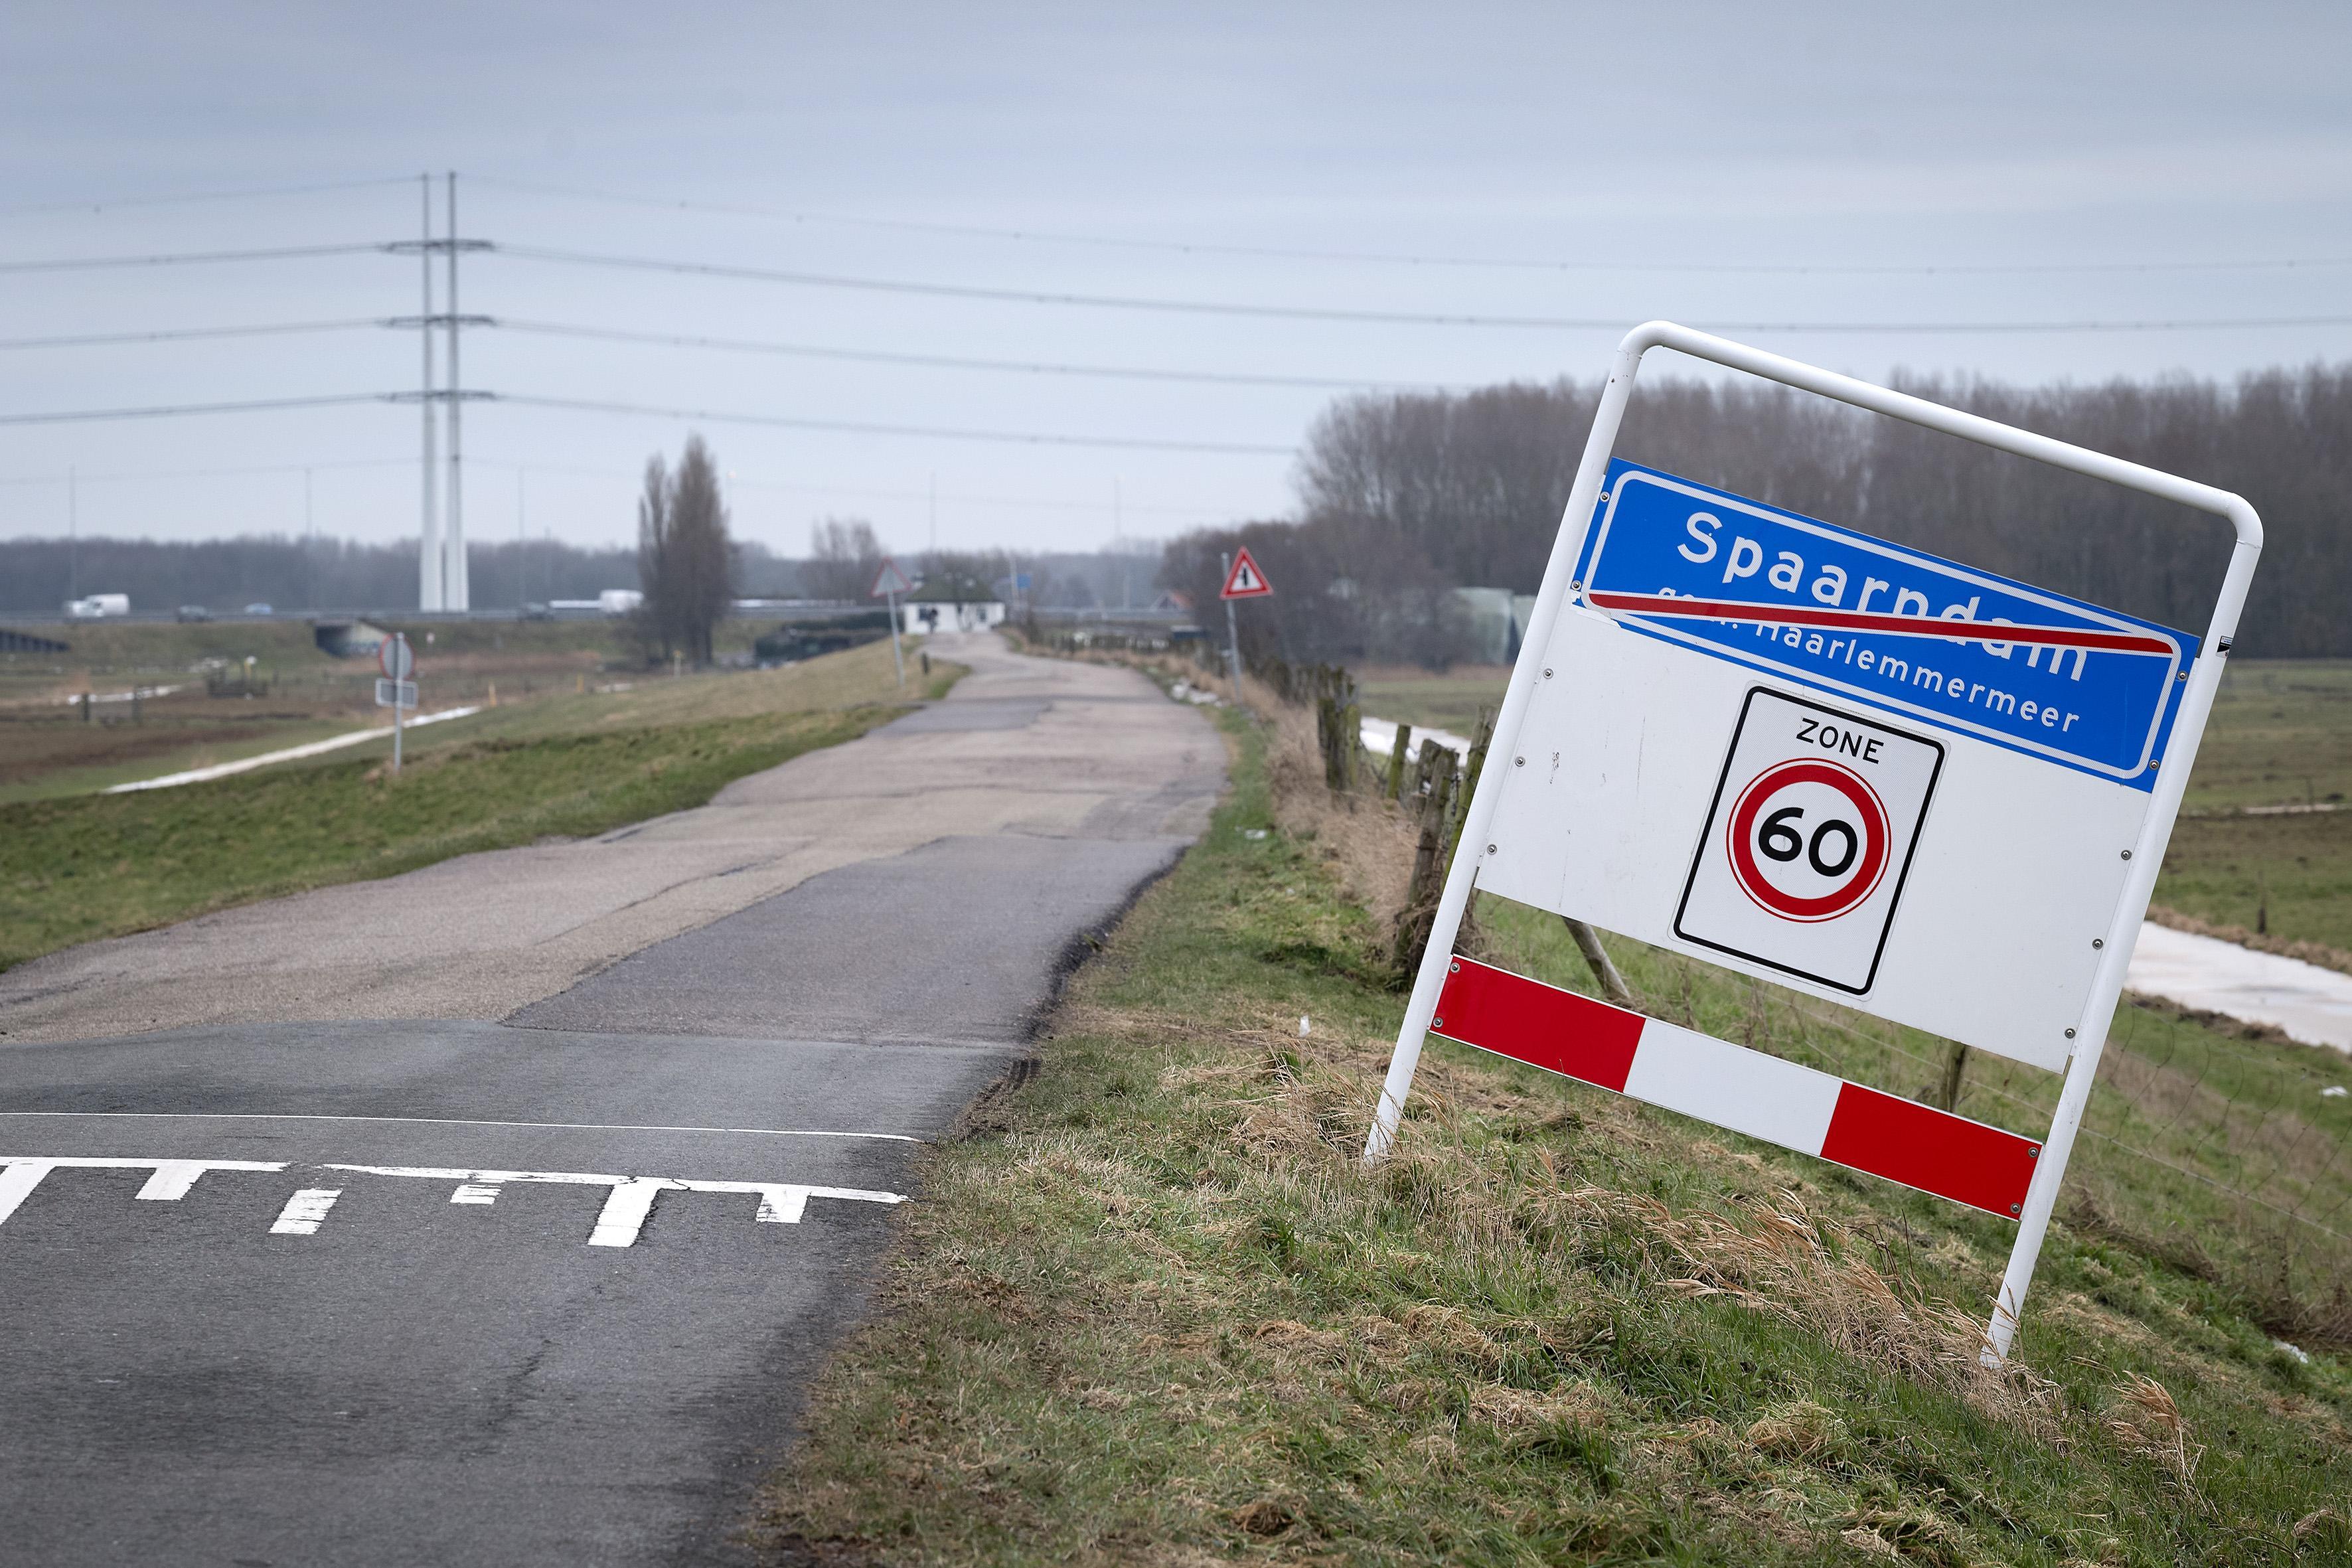 Haarlemmermeer: Beemster XXL pal naast de luchthaven Schiphol